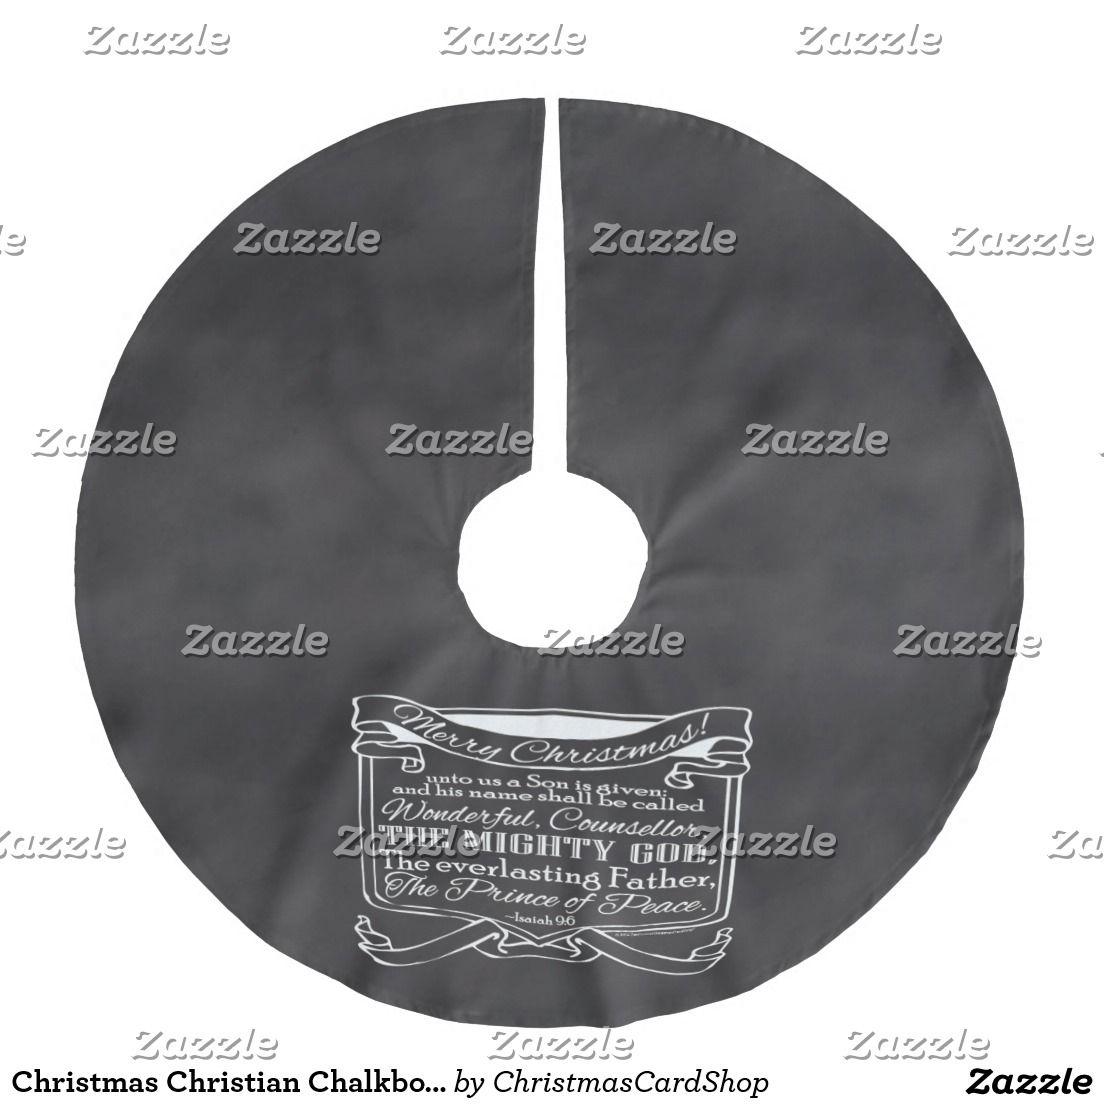 Christmas Christian Chalkboard Scripture Brushed Polyester Tree Skirt